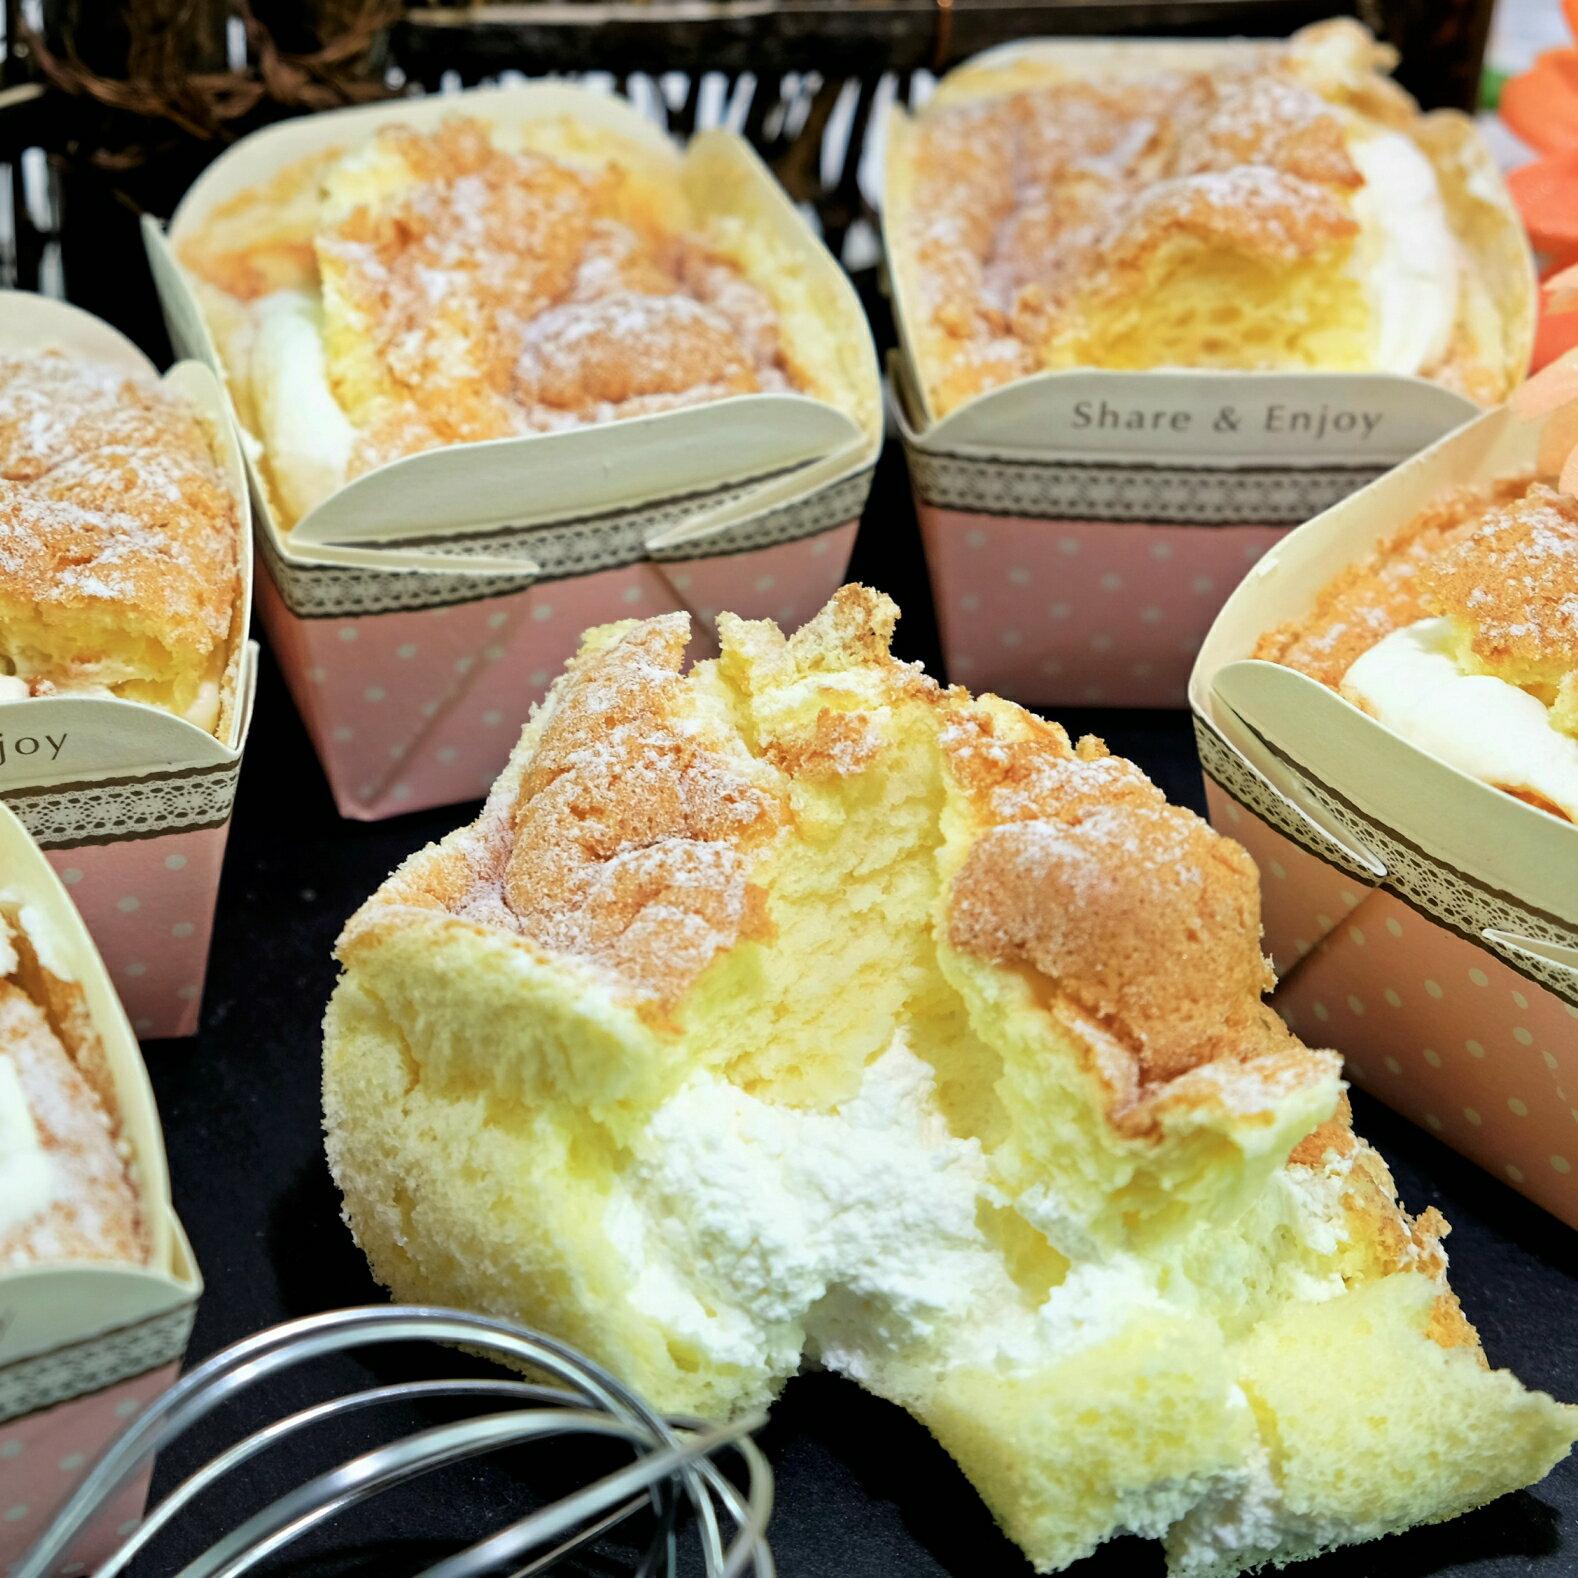 【Sara-Cake烘焙坊】北海道奶霜戚風蛋糕 6入